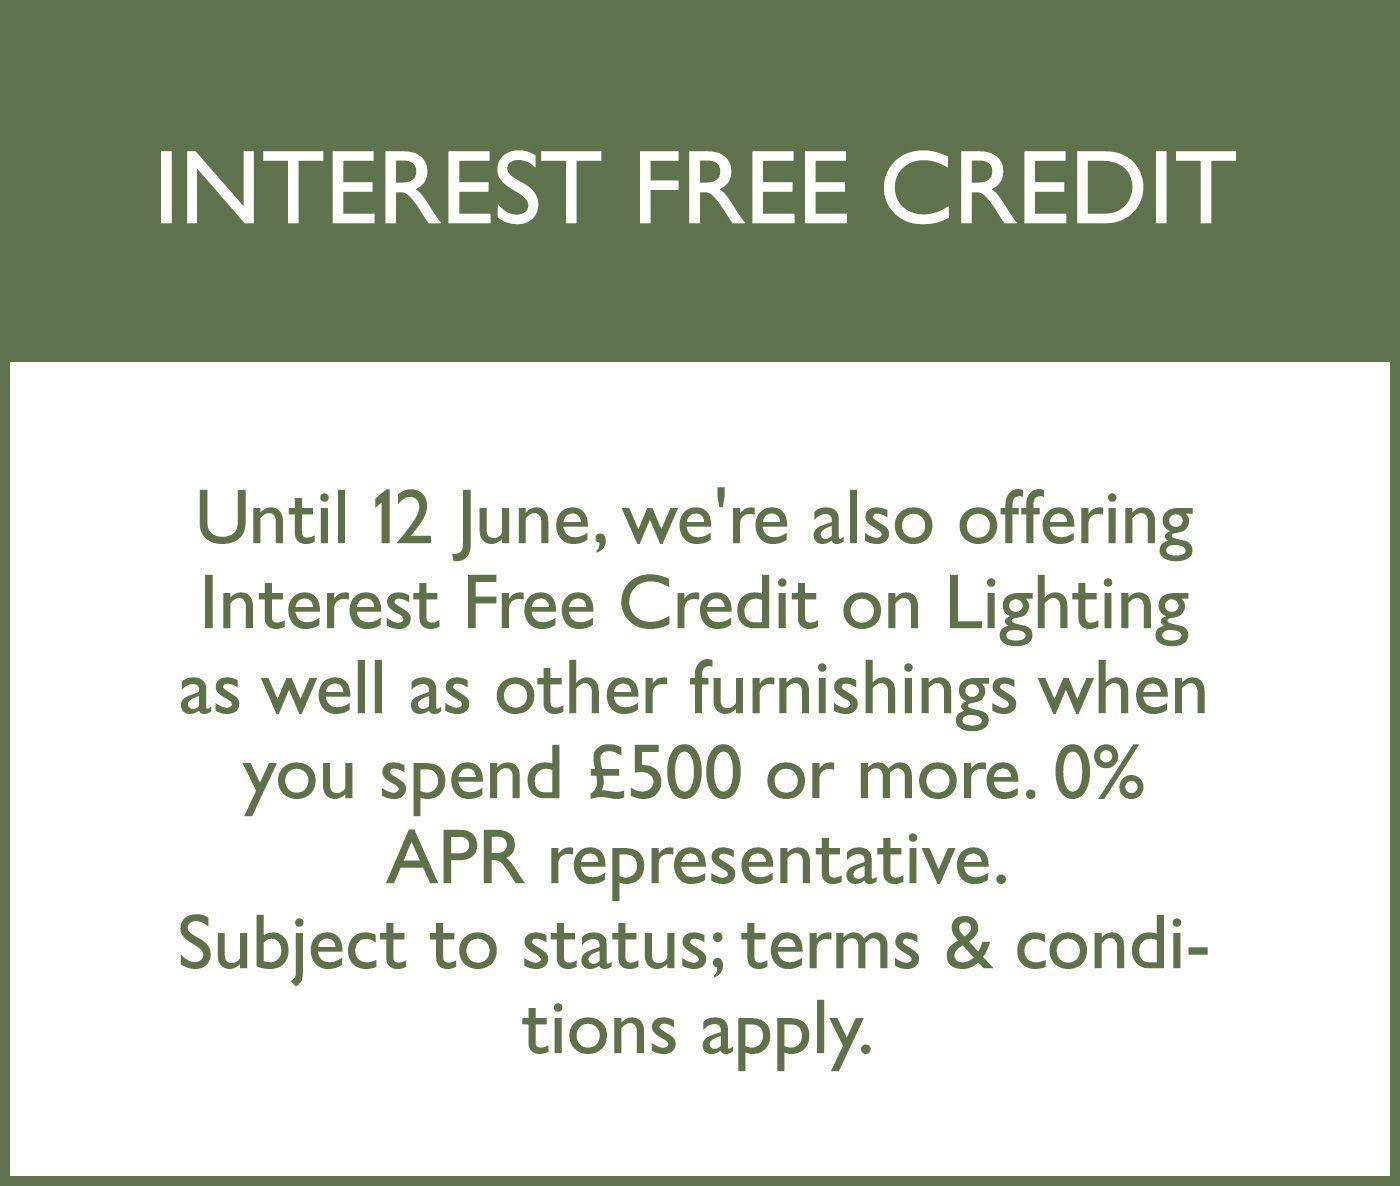 770c275fc0d Interest free credit on lighting offer